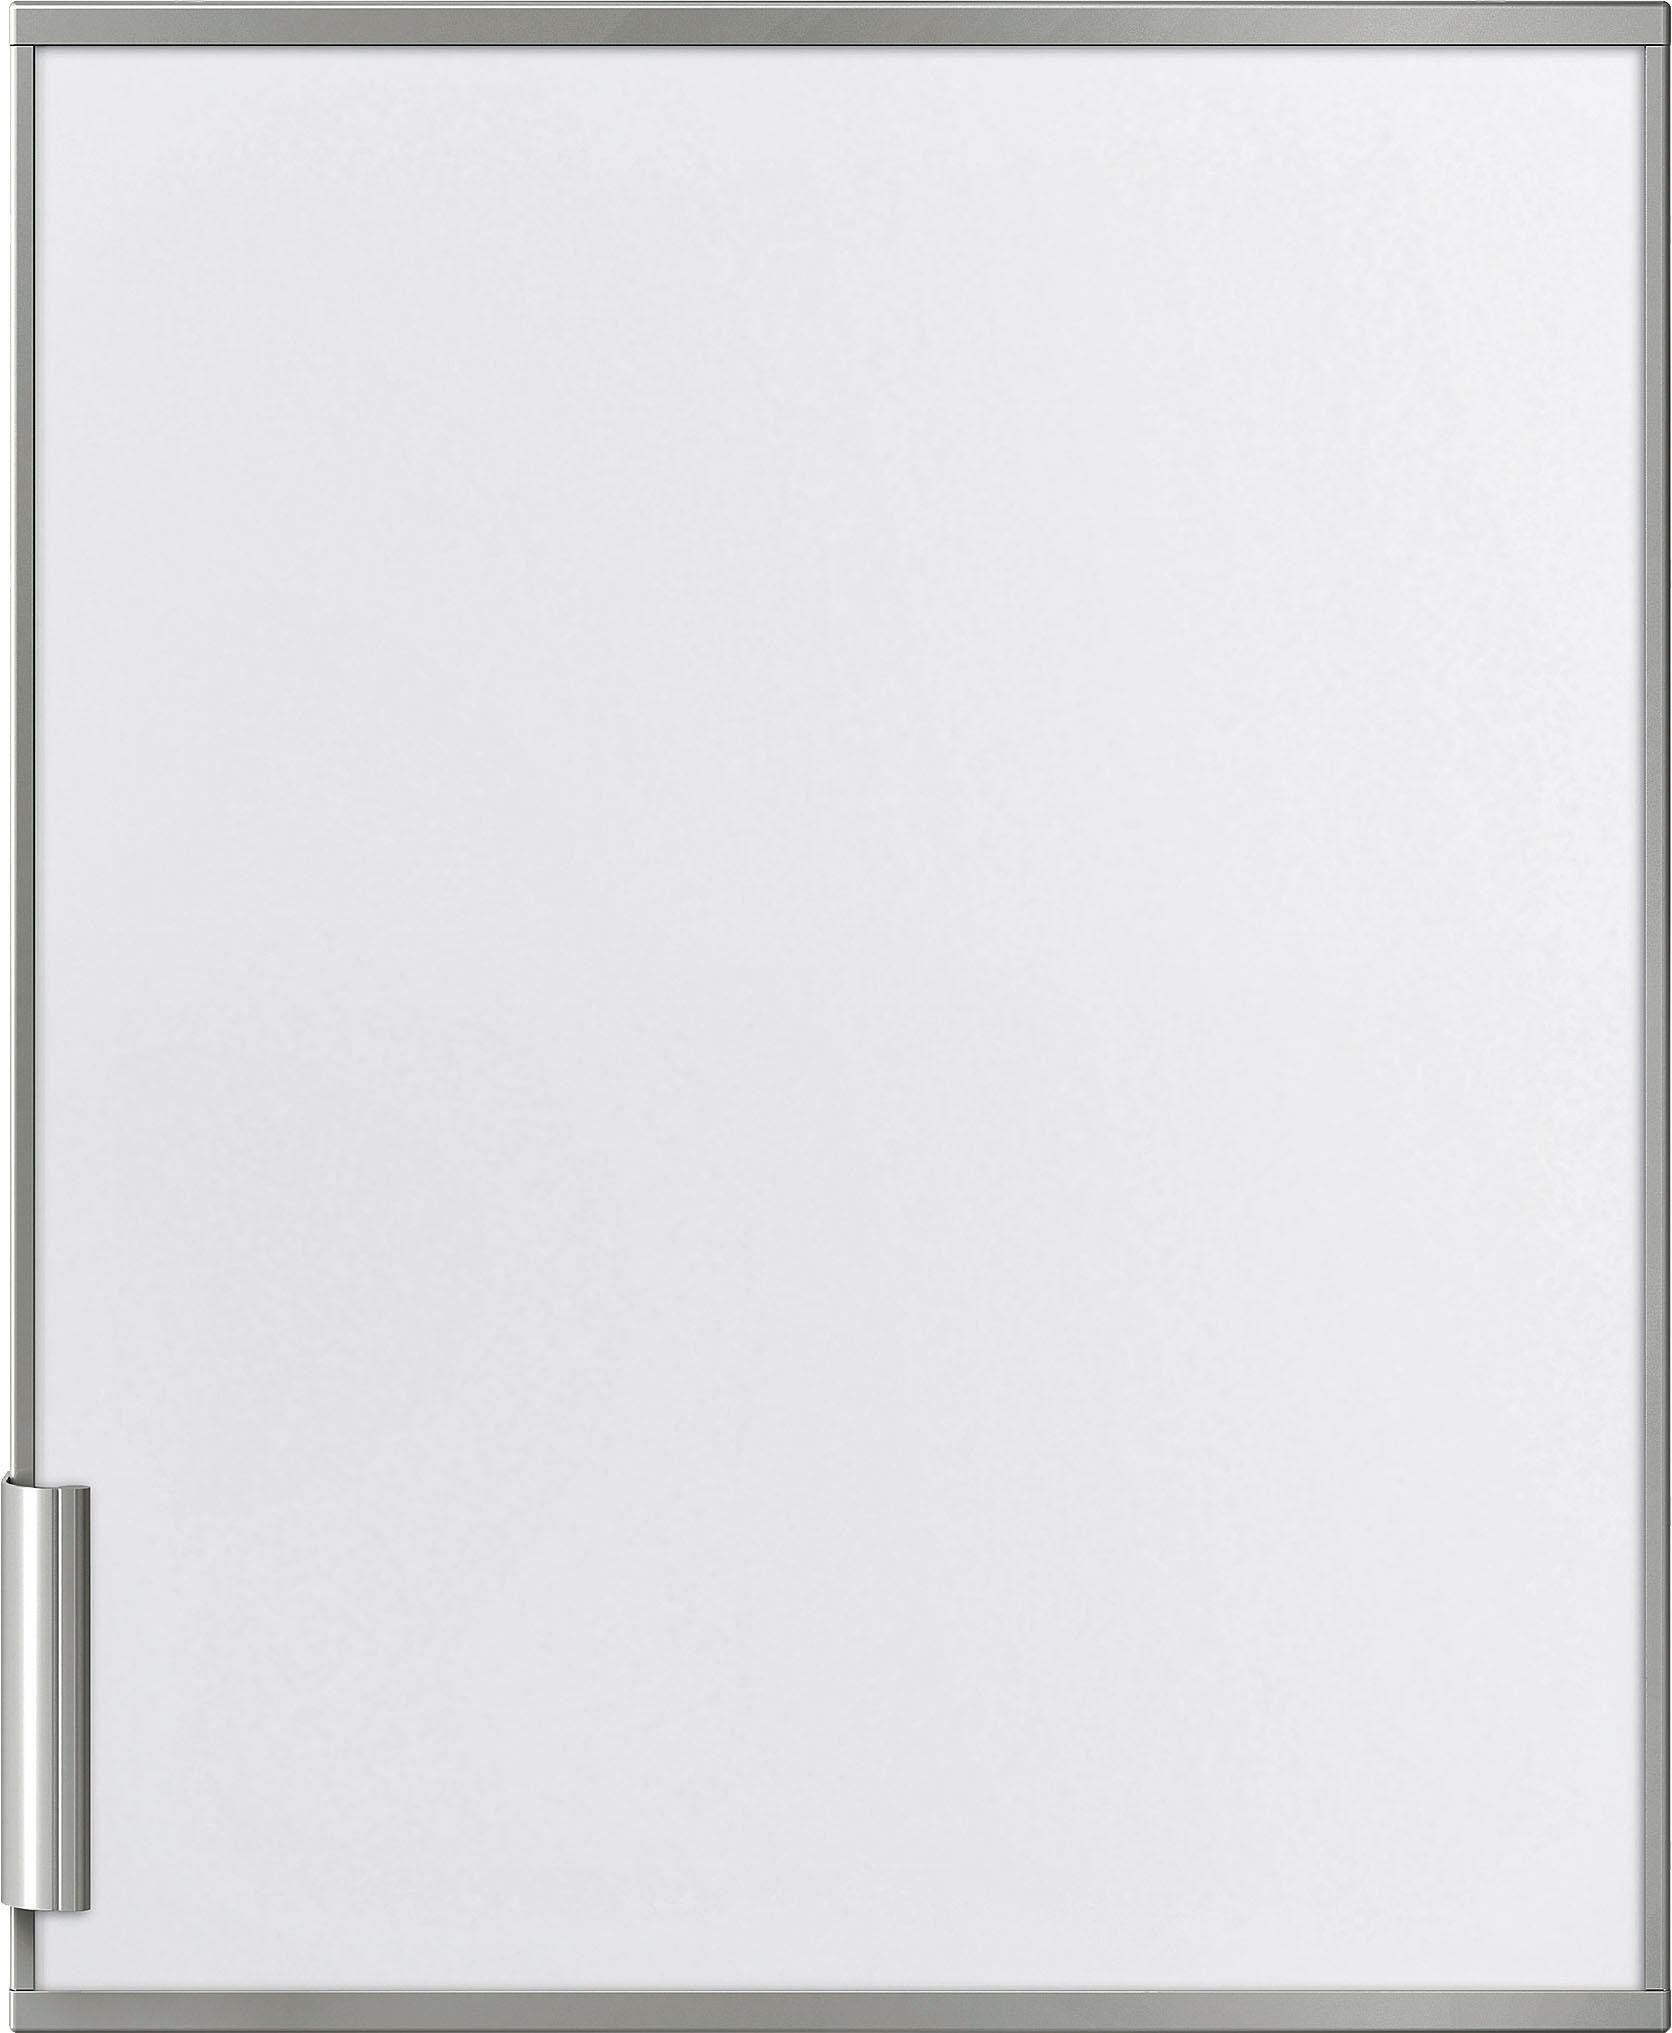 Bosch Türfront KFZ10AX0, mit Alu-Dekorrahmen